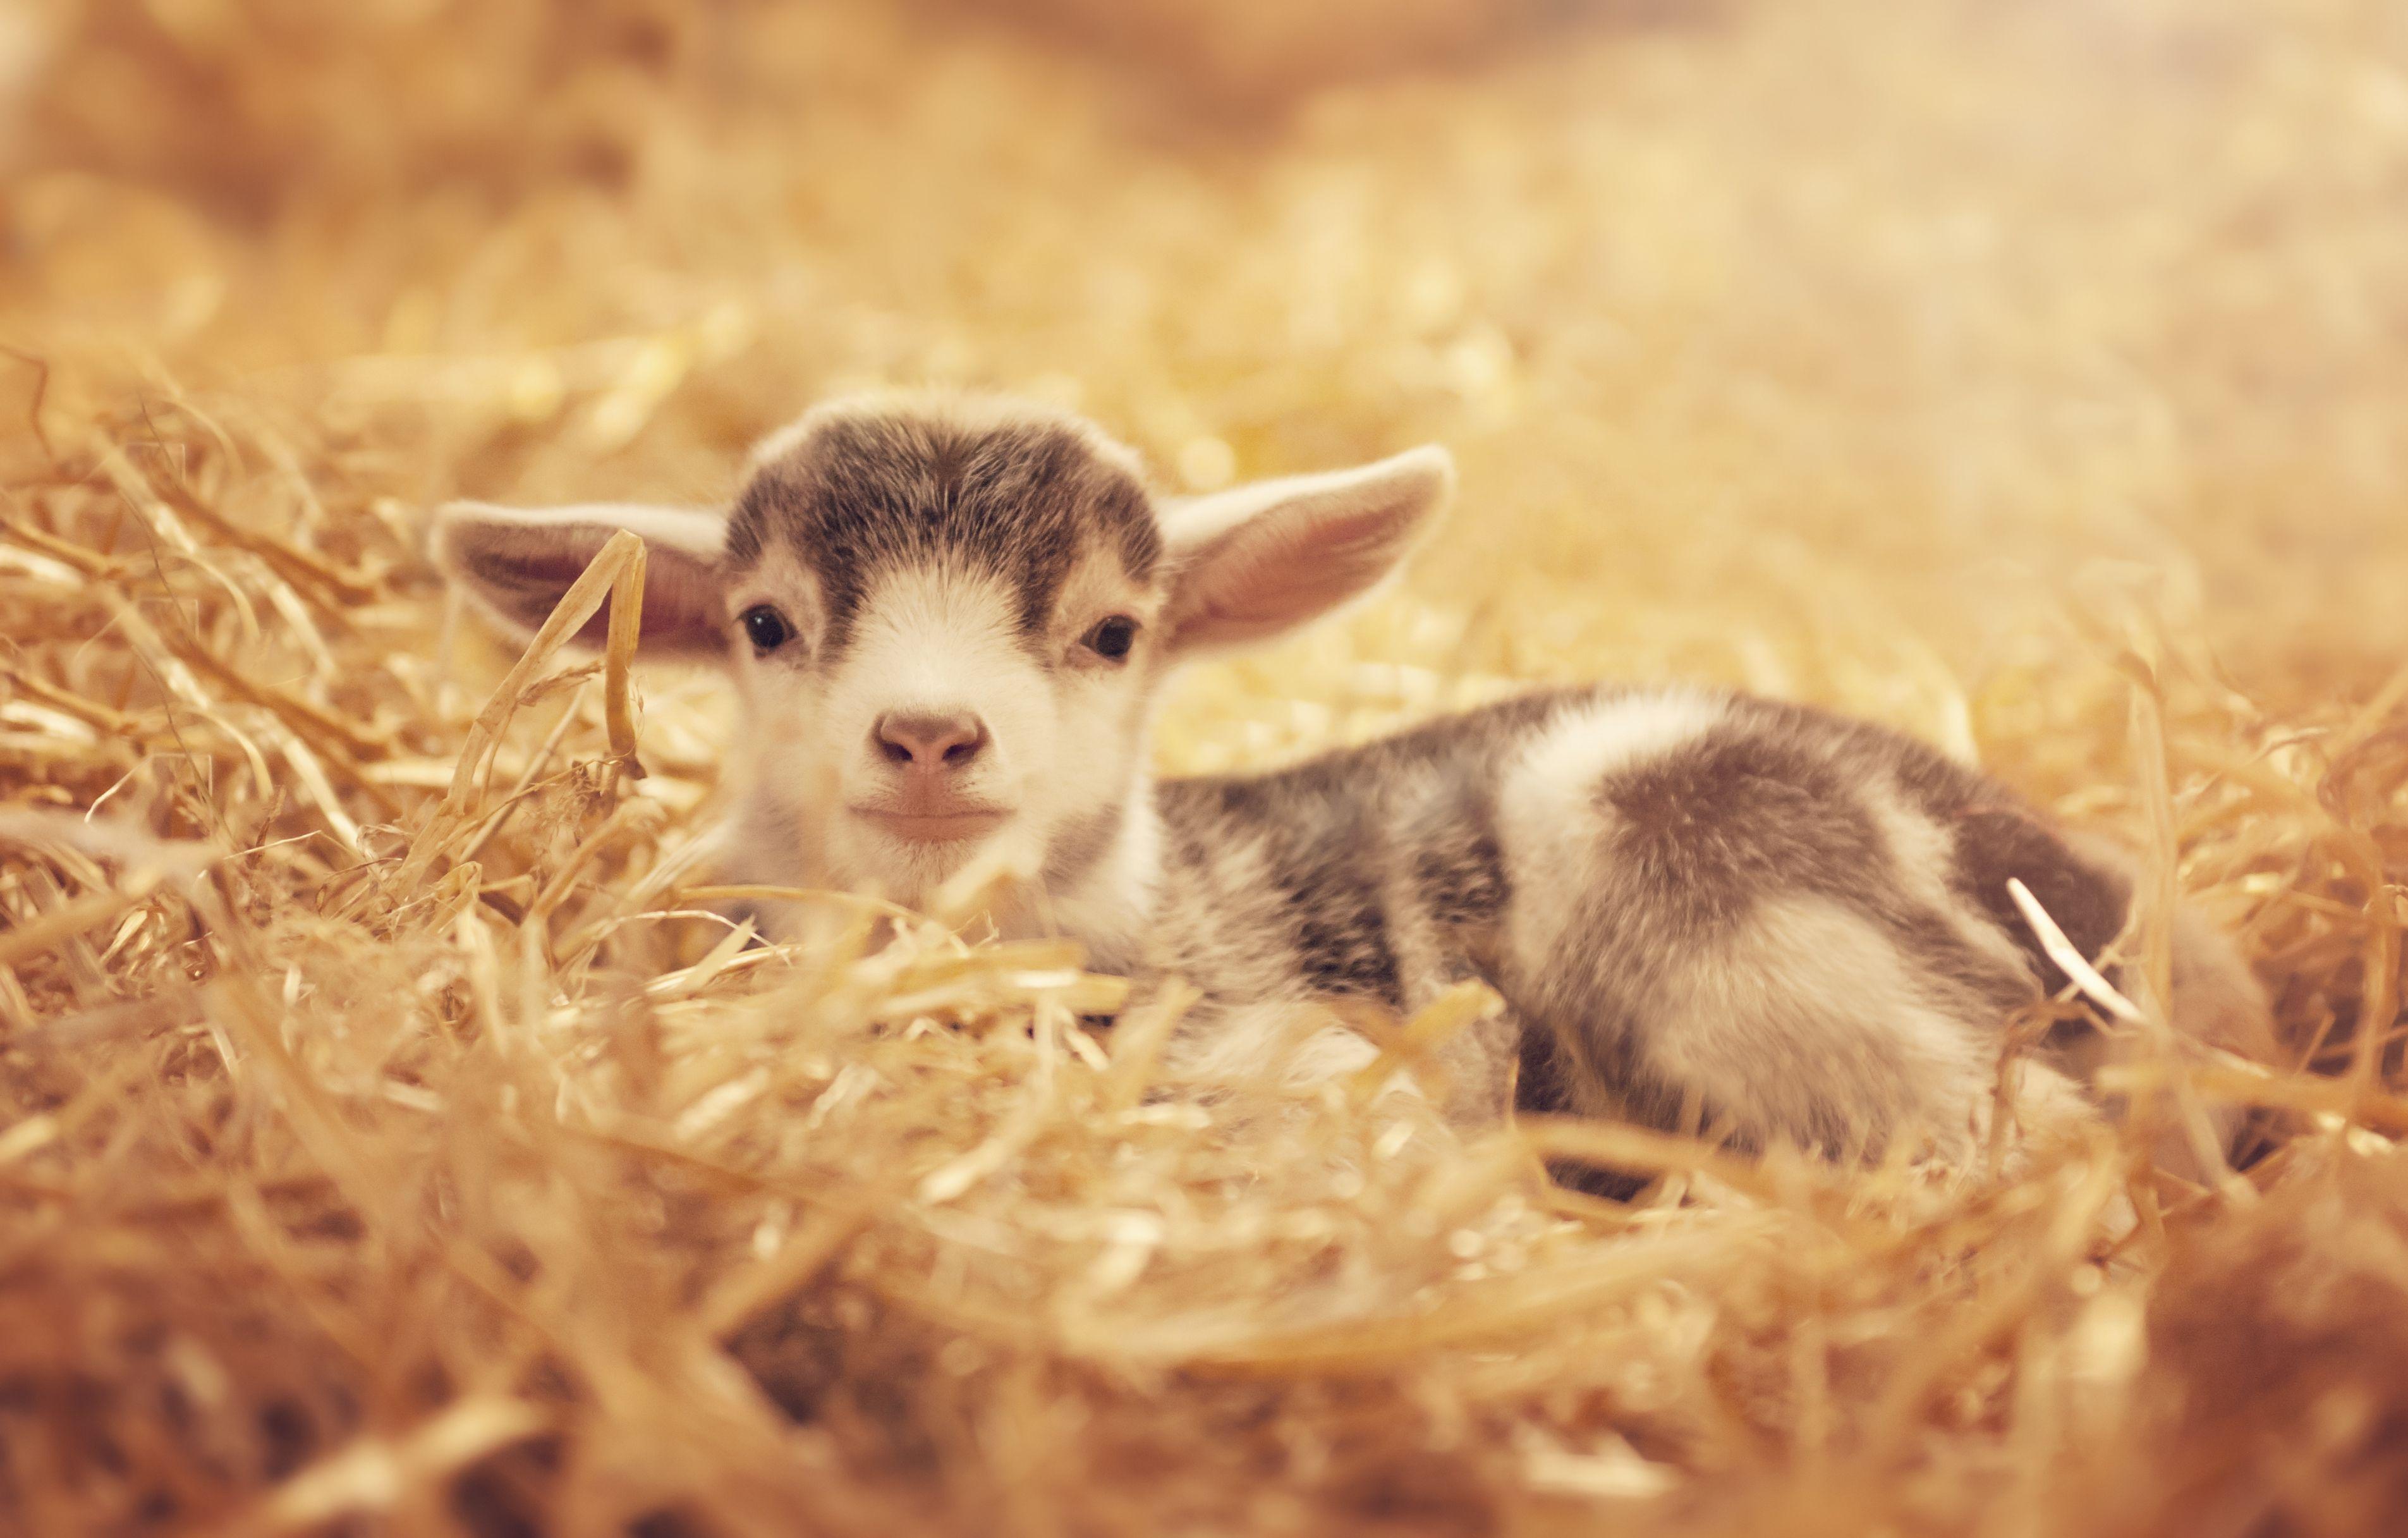 baby animals cute photos